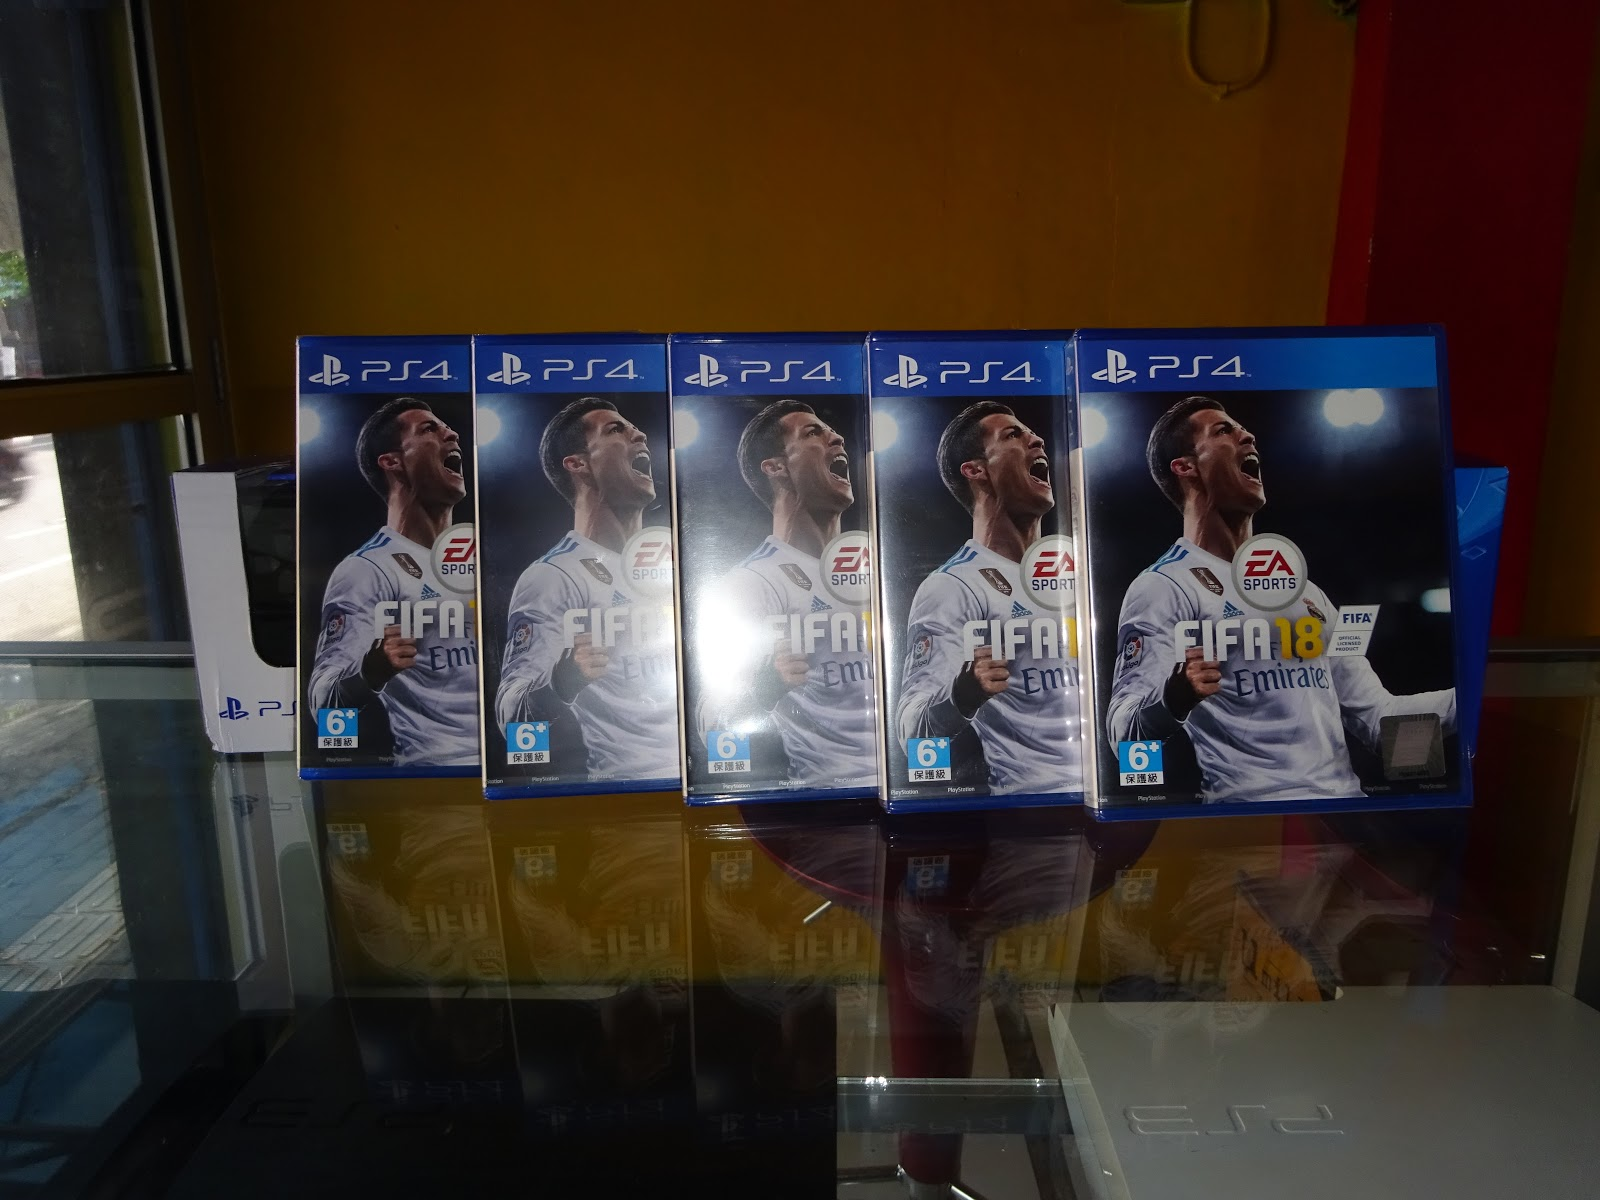 Bdkaset Ps 4 Fifa 2018 Jogja Viva Game Ps4 Ps3 Ps2 Psp Kaset Xbox 360 Bd Baru